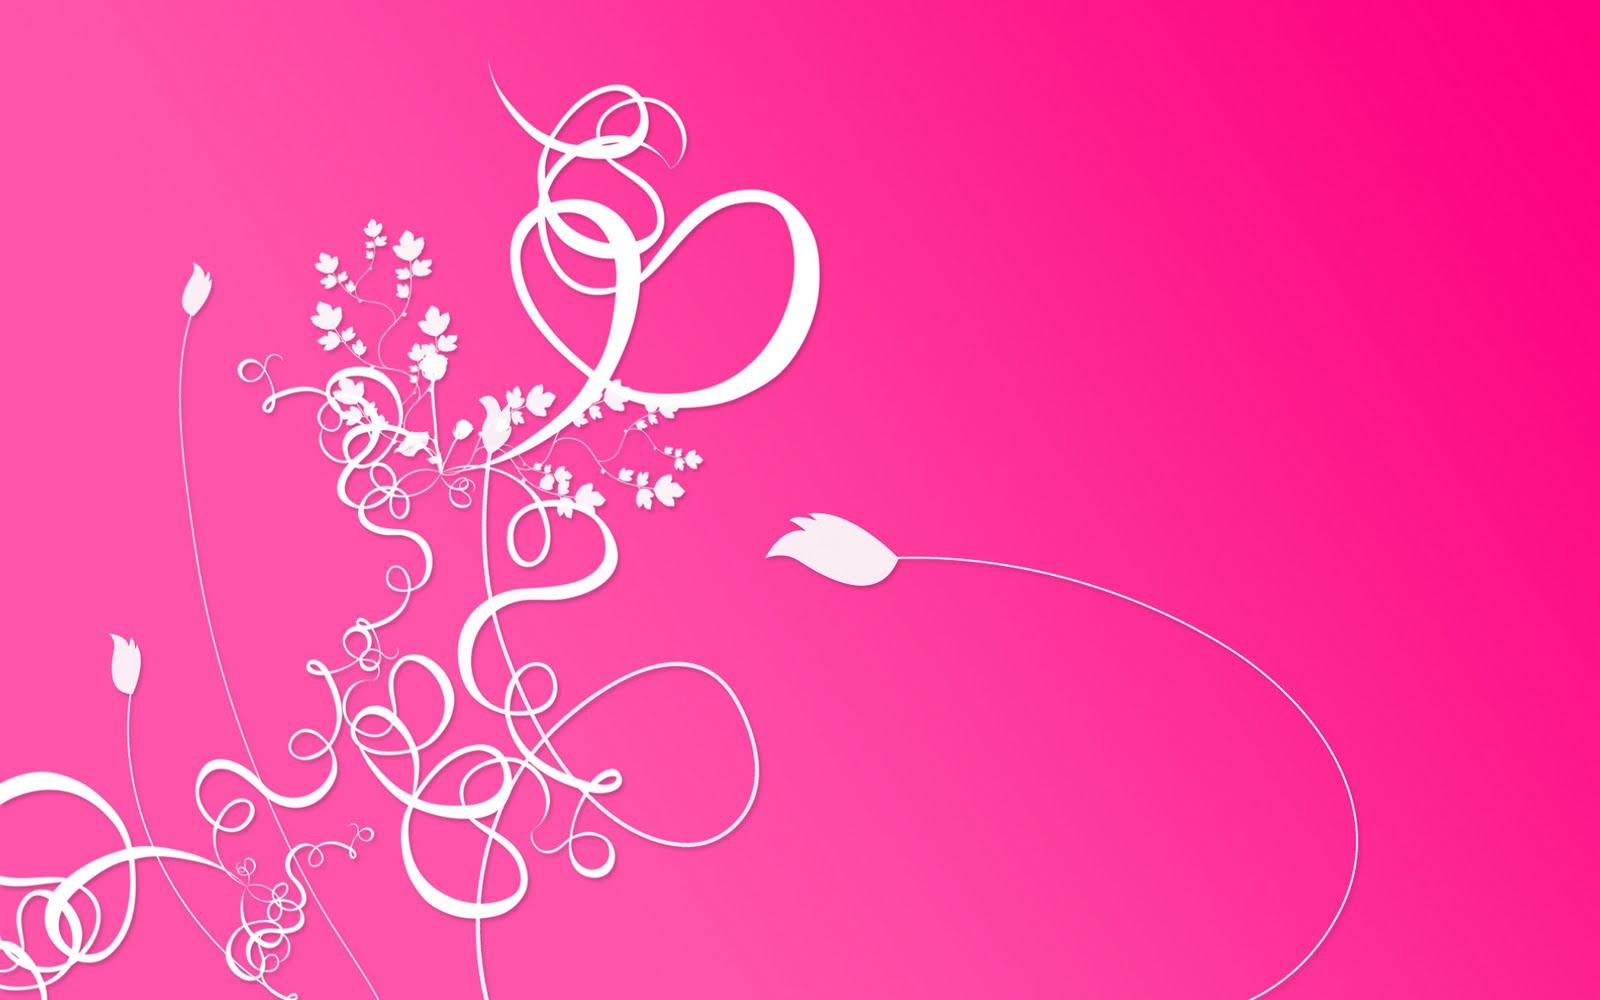 Hot Pink Backgrounds For Desktop 31 Hd Wallpaper Hdblackwallpaper Com